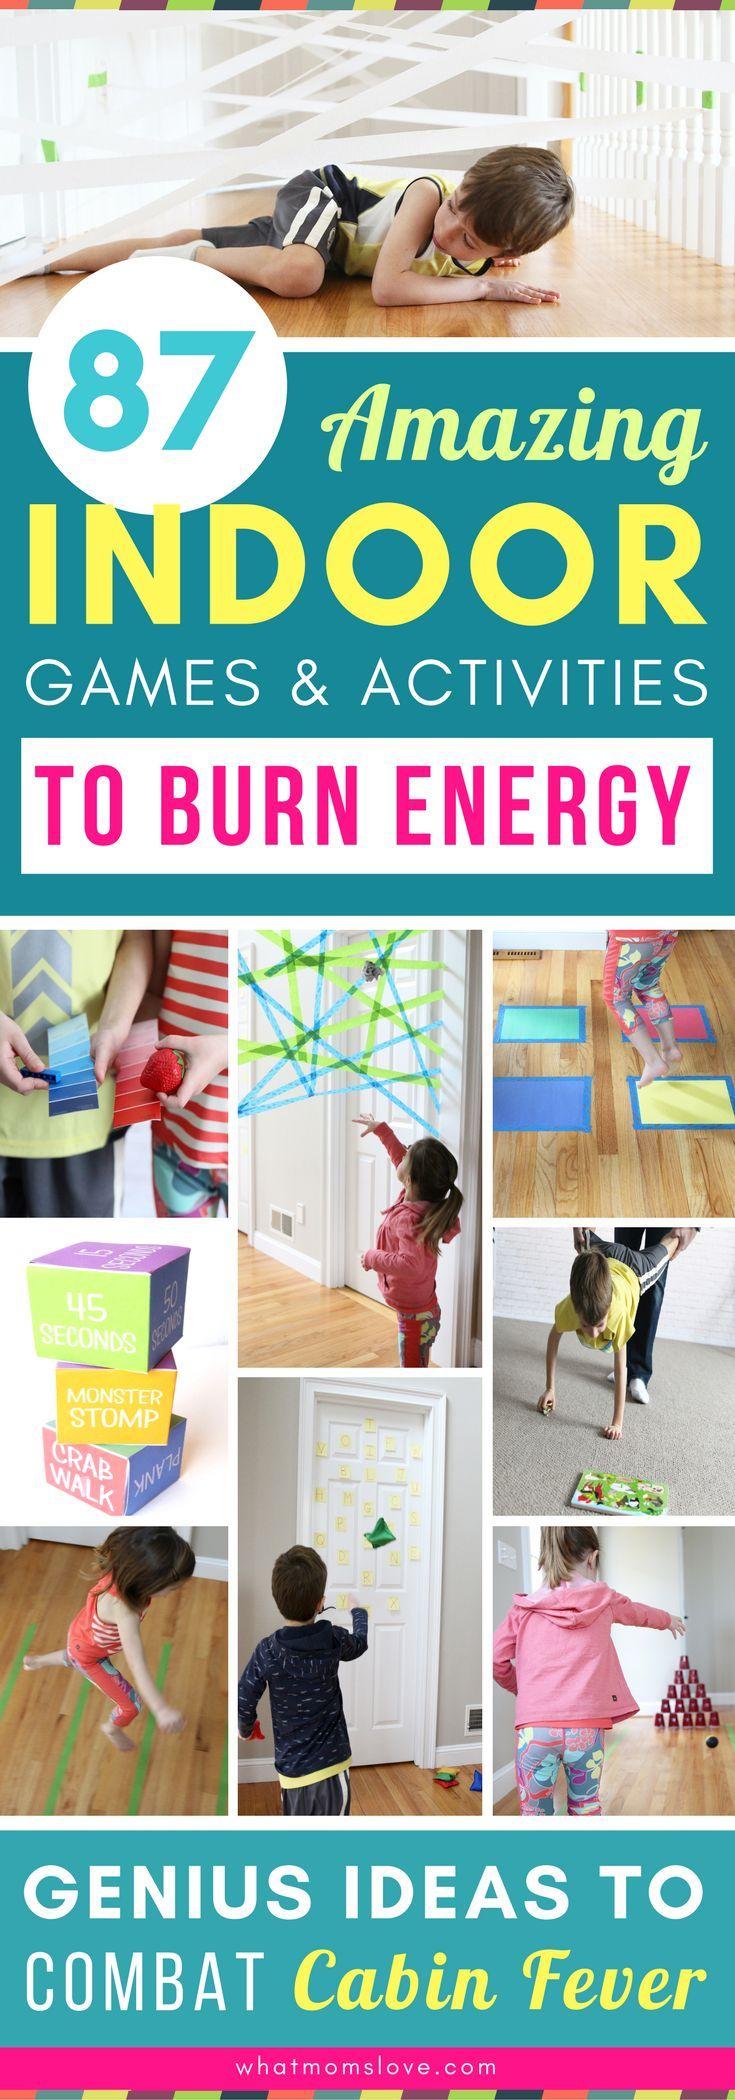 87 Energy-Busting Indoor Games & Activities For Kids (Because Cabin Fever Is No Joke) – Pregnant Chicken   Pregnancy + Newborn Tips